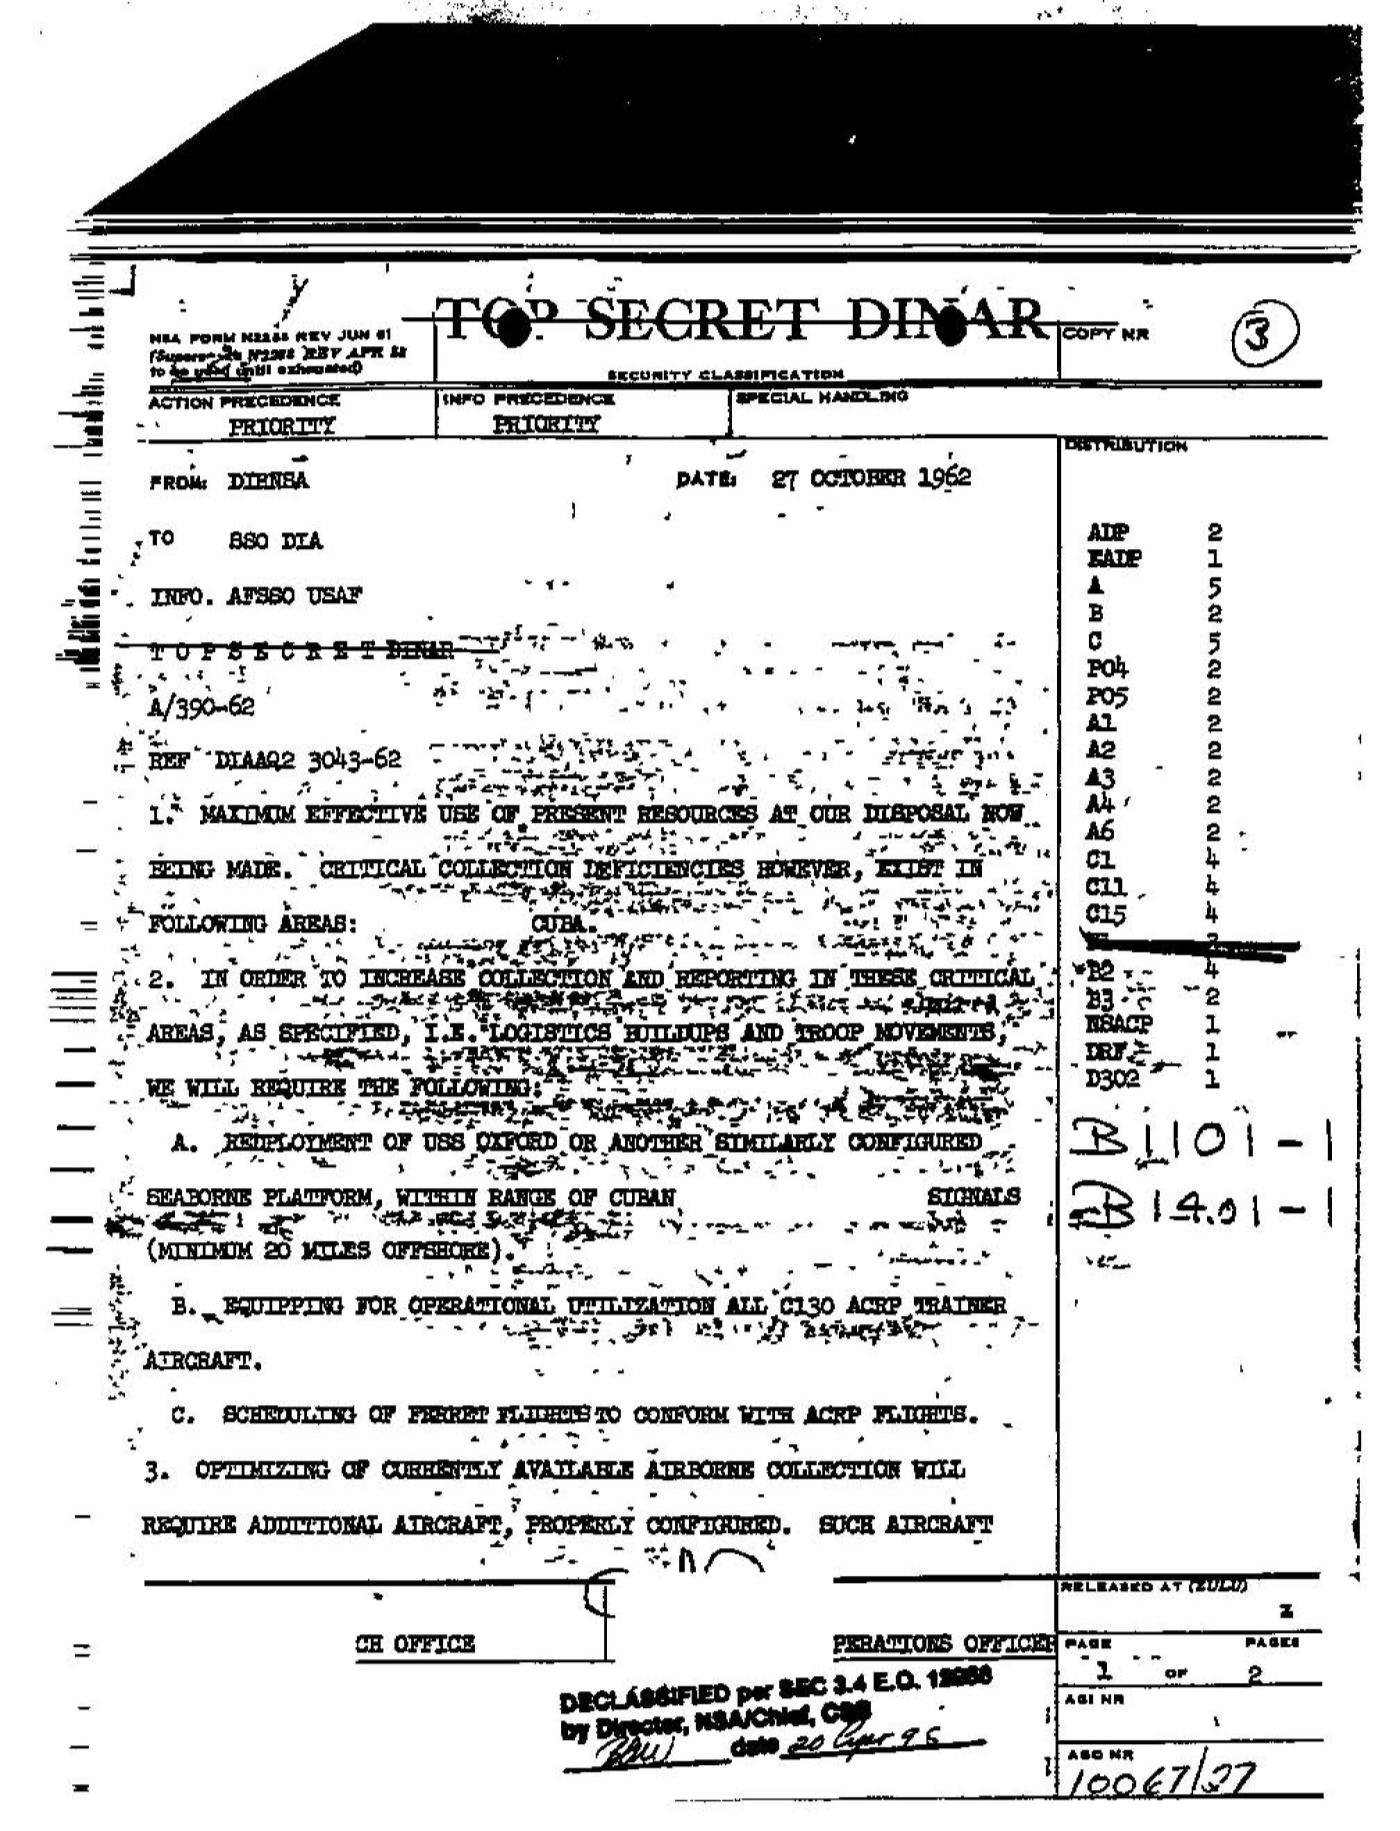 27_OCTOBER_DIRNSA_MESSAGE.PDF